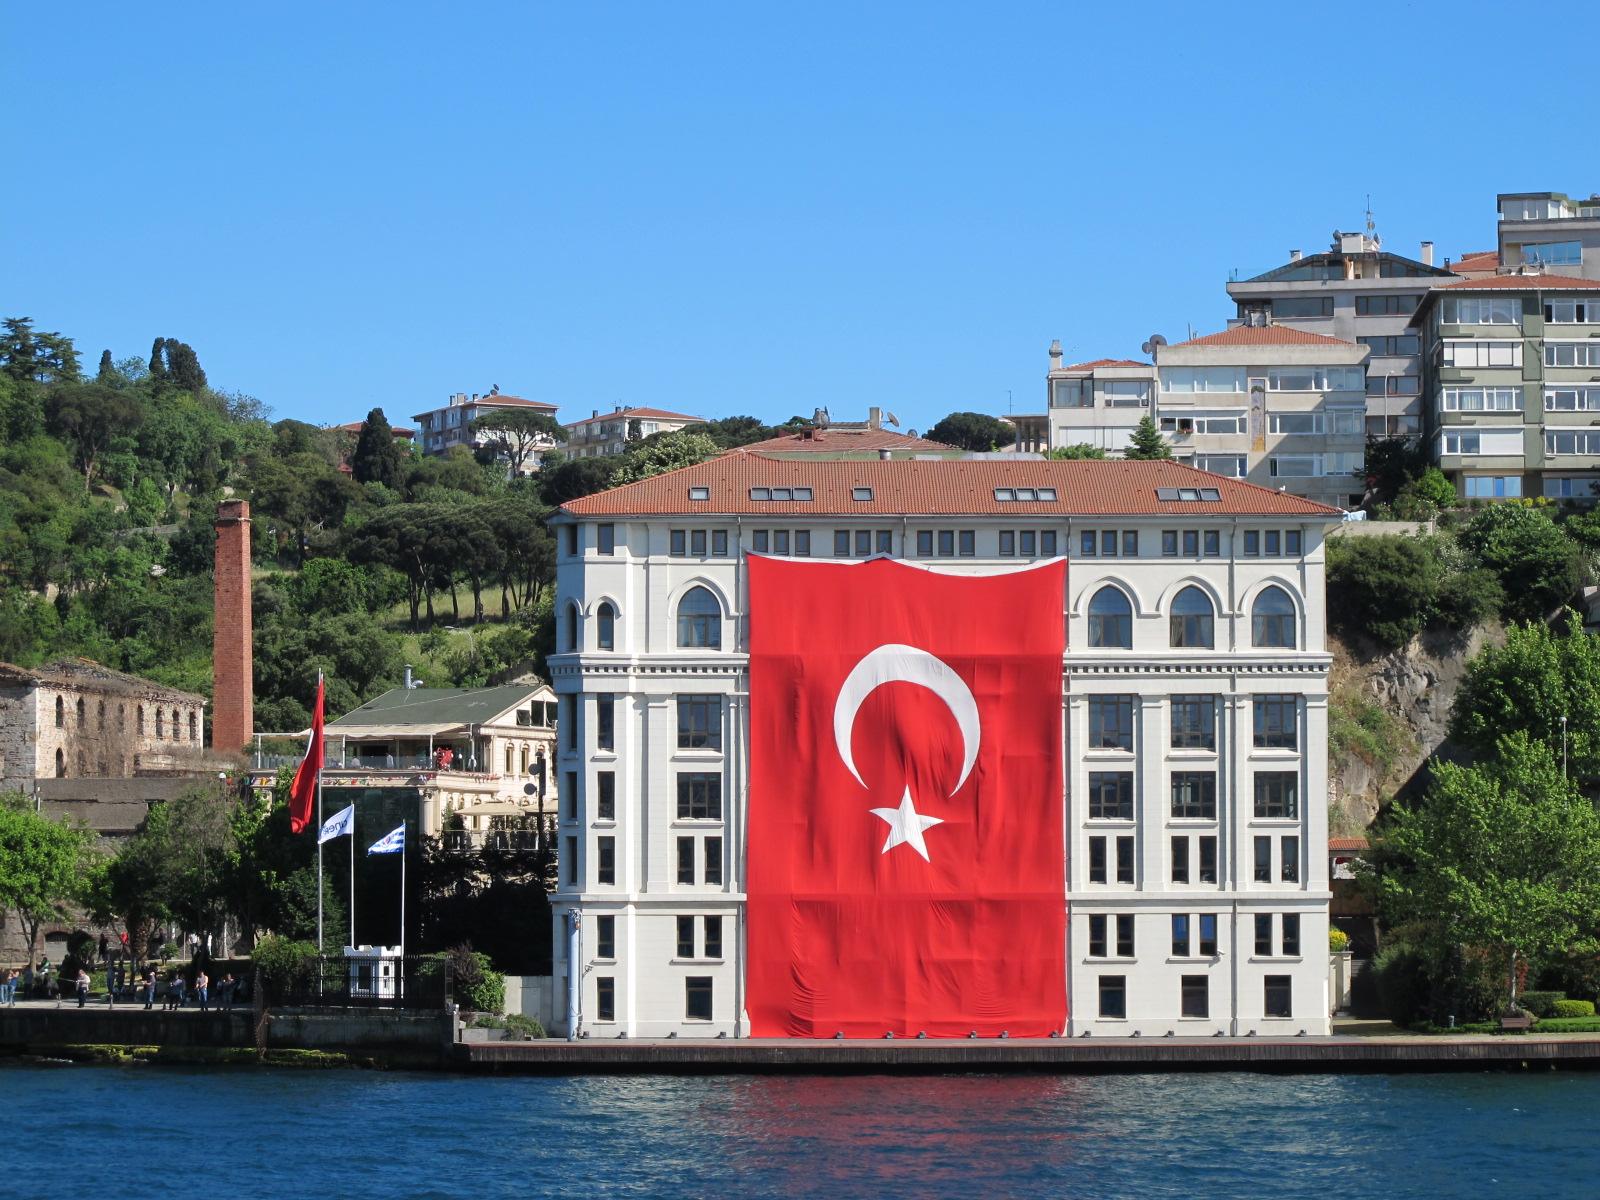 large Turkish flag